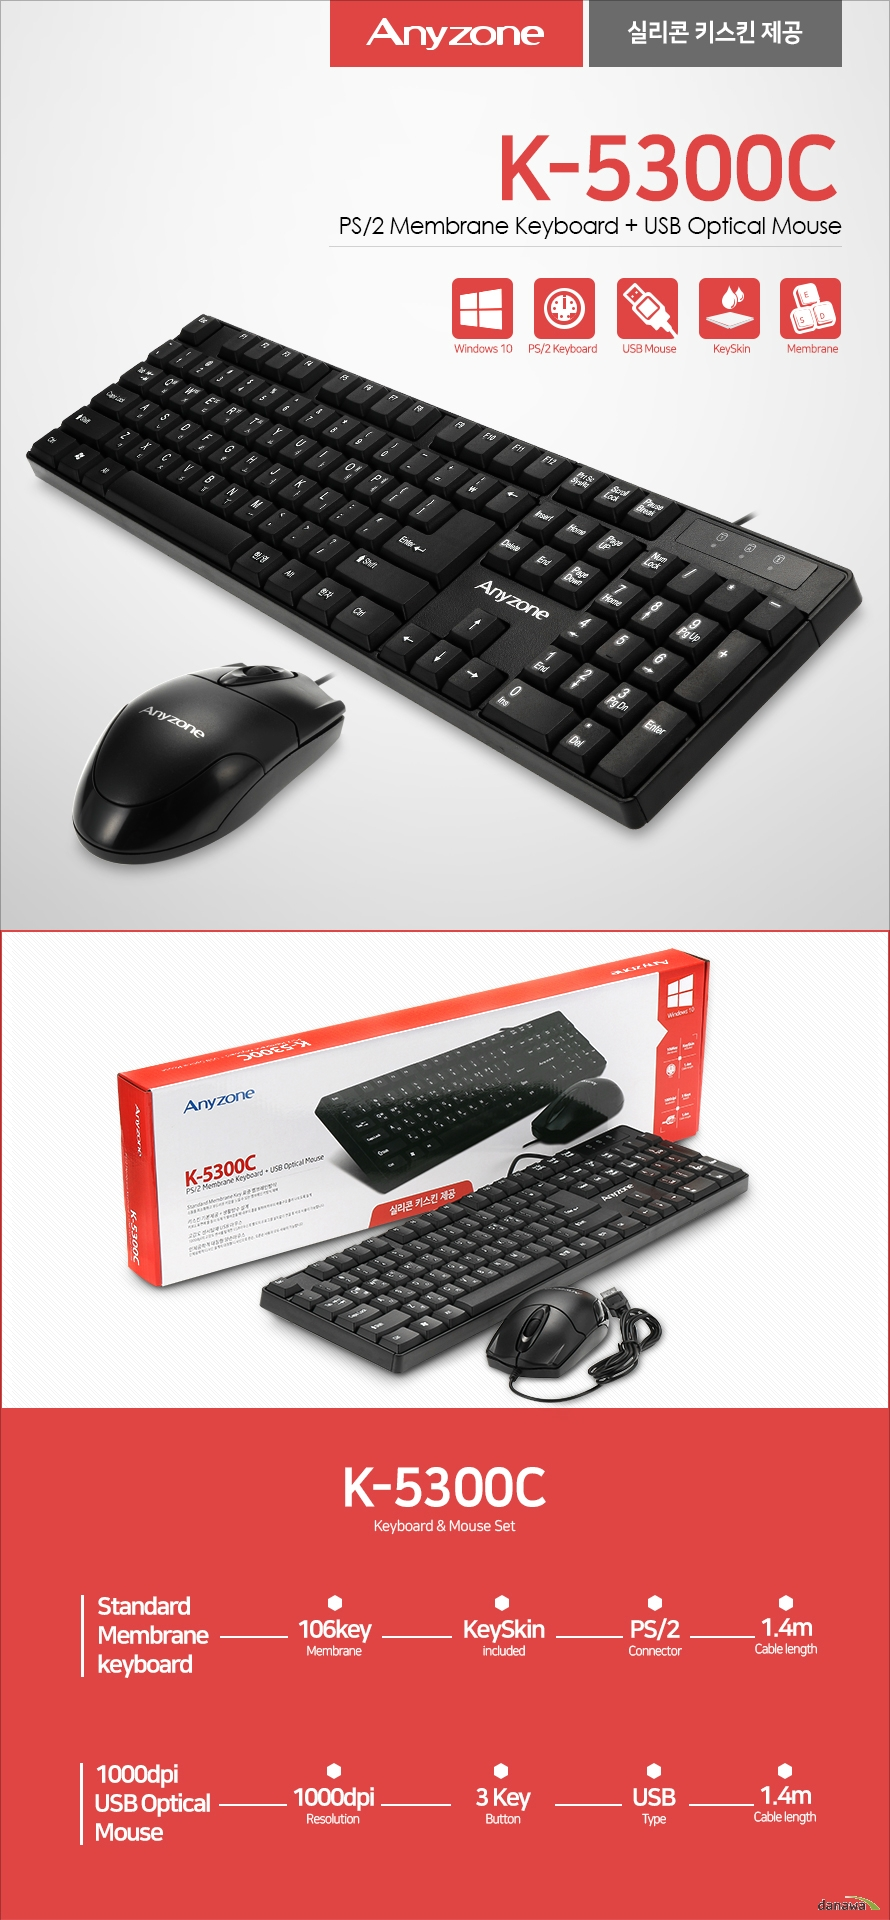 anyzone K-5300C PS/2 Membrane Keyboard + USB Optical Mouse 실리콘 키스킨 제공 Keyboard & Mouse Set Standard  Membrane  keyboard 1000dpi  USB Optical  Mouse 키보드 106 Key Layout  표준 106Key 배열 키보드 k-5300C 는 한자키와 한/영키를 오른편에 배치한 106키 표준 배열로 제작된 제품입니다. 따로 적응할 필요없는 표준 배열로, 누구나 편리하게 사용하실 수 있습니다.Waterproof Design 생활 방수 설계 키보드  음료가 키보드에 묻거나 스며드는 경우를 대비하여 생활 방수 기능을 추가하였습니다. 물에 취약한 키보드와 달리 ANYZONE 키보드는 걱정없이 안전하게 사용할 수 있습니다. Membrane interface 조용하고 정확한 멤브레인 키보드 멤브레인 인터페이스는 타이핑 소음도가 낮은 특징을 가지고 있습니다. 소음에 민감한 사무실에 적합하며 사용자가 부드러운 키감을 느낄 수 있게 설계되었습니다. 저소음 타이핑을 위한 고품질 키 캡 오타없는 키 입력을 위한 표준 106Key 배열 silicon Material Key skin 실리콘 키스킨 기본 제공 키보드의 외부 오염을 막아주는 실리콘 키스킨을 기본적으로 제공합니다. 실리콘 소재로 인체에 무해하며 오랜기간동안 사용해도 변질되지 않습니다. convenience 편의성을 고려한 설계 사용자 편의성을 위해 높이 조절기, 미끄럼 방지 고무 받침대를 장착하였으며 설치 환경을 고려해 중앙이 아닌  우측 방향으로 케이블을 배치하였습니다. 미끄럼 방지 고무 받침 자유로운 높이 조절 기능 배치 공간을 고려한 우측 케이블 설계 마우스 High speed certified usb mouse 고감도 센서탑재 USB 마우스 K-5300C 마우스는 어느 컴퓨터와도 호환되는  USB 인터페이스를 지원합니다. 별도의 프로그램 설치없이  연결후 편리하게 사용이 가능합니다. 1000dpi resolution 섬세한 작업을 위한 옵티컬 센서 K-5300C 마우스는 1000dpi의 고감도 센서를 탑재하여 섬세한 작업까지 정확하게 할 수 있도록 최적의 환경을 제공합니다.  Smooth wheel 웹서핑에 최적화된 휠 스크롤 K-5300C 마우스는 웹서핑과 게이밍시 정확한 스크롤을 가능하게 하는 스크롤 휠 탑재로 부드러운 사용감과 완벽한 성능을 제공합니다.  Design for human 인체공학적 대칭형 양손마우스 K-5300C 마우스는 인체공학적 디자인 설계의 대칭형  양손 마우스입니다.  왼손, 오른손 사용자 모두 사용이 가능하며  사용감이 뛰어나 장시간의 사용에도 피로하지 않습니다.   K-5300C PS/2 Membrane Keyboard + USB Optical Mouse SPECIFICATION Keyboard (KM-5300P) Key layout 106key  Size 가로 440mm 세로 126mm 너비20mm  Interface PS/2 선 길이 1.3m Mouse (SMOU-5300WX) Resolution 1000dpi   Size 세로 115 가로 60 너비 37mm  interface  USB 선 길이 1.4m System requirement  IBM compatibility system   Windows 98/2000/ME/XP/VISTA/WIN7/WIN8/WIN10 OS  상품 정보 제품명 : 유선 키보드 마우스 세트  모델명 : K-5300C 판매원 : SANGDO I&T CO.,LTD 제  조국 : 중국/China  반품 및 교환 : 구입처 및 판매원 인증번호  MSIP-REI-MLC-KM-5300P/MSIP-REI-MLC-SMOU-5300WX 고객센터 02-707-3161